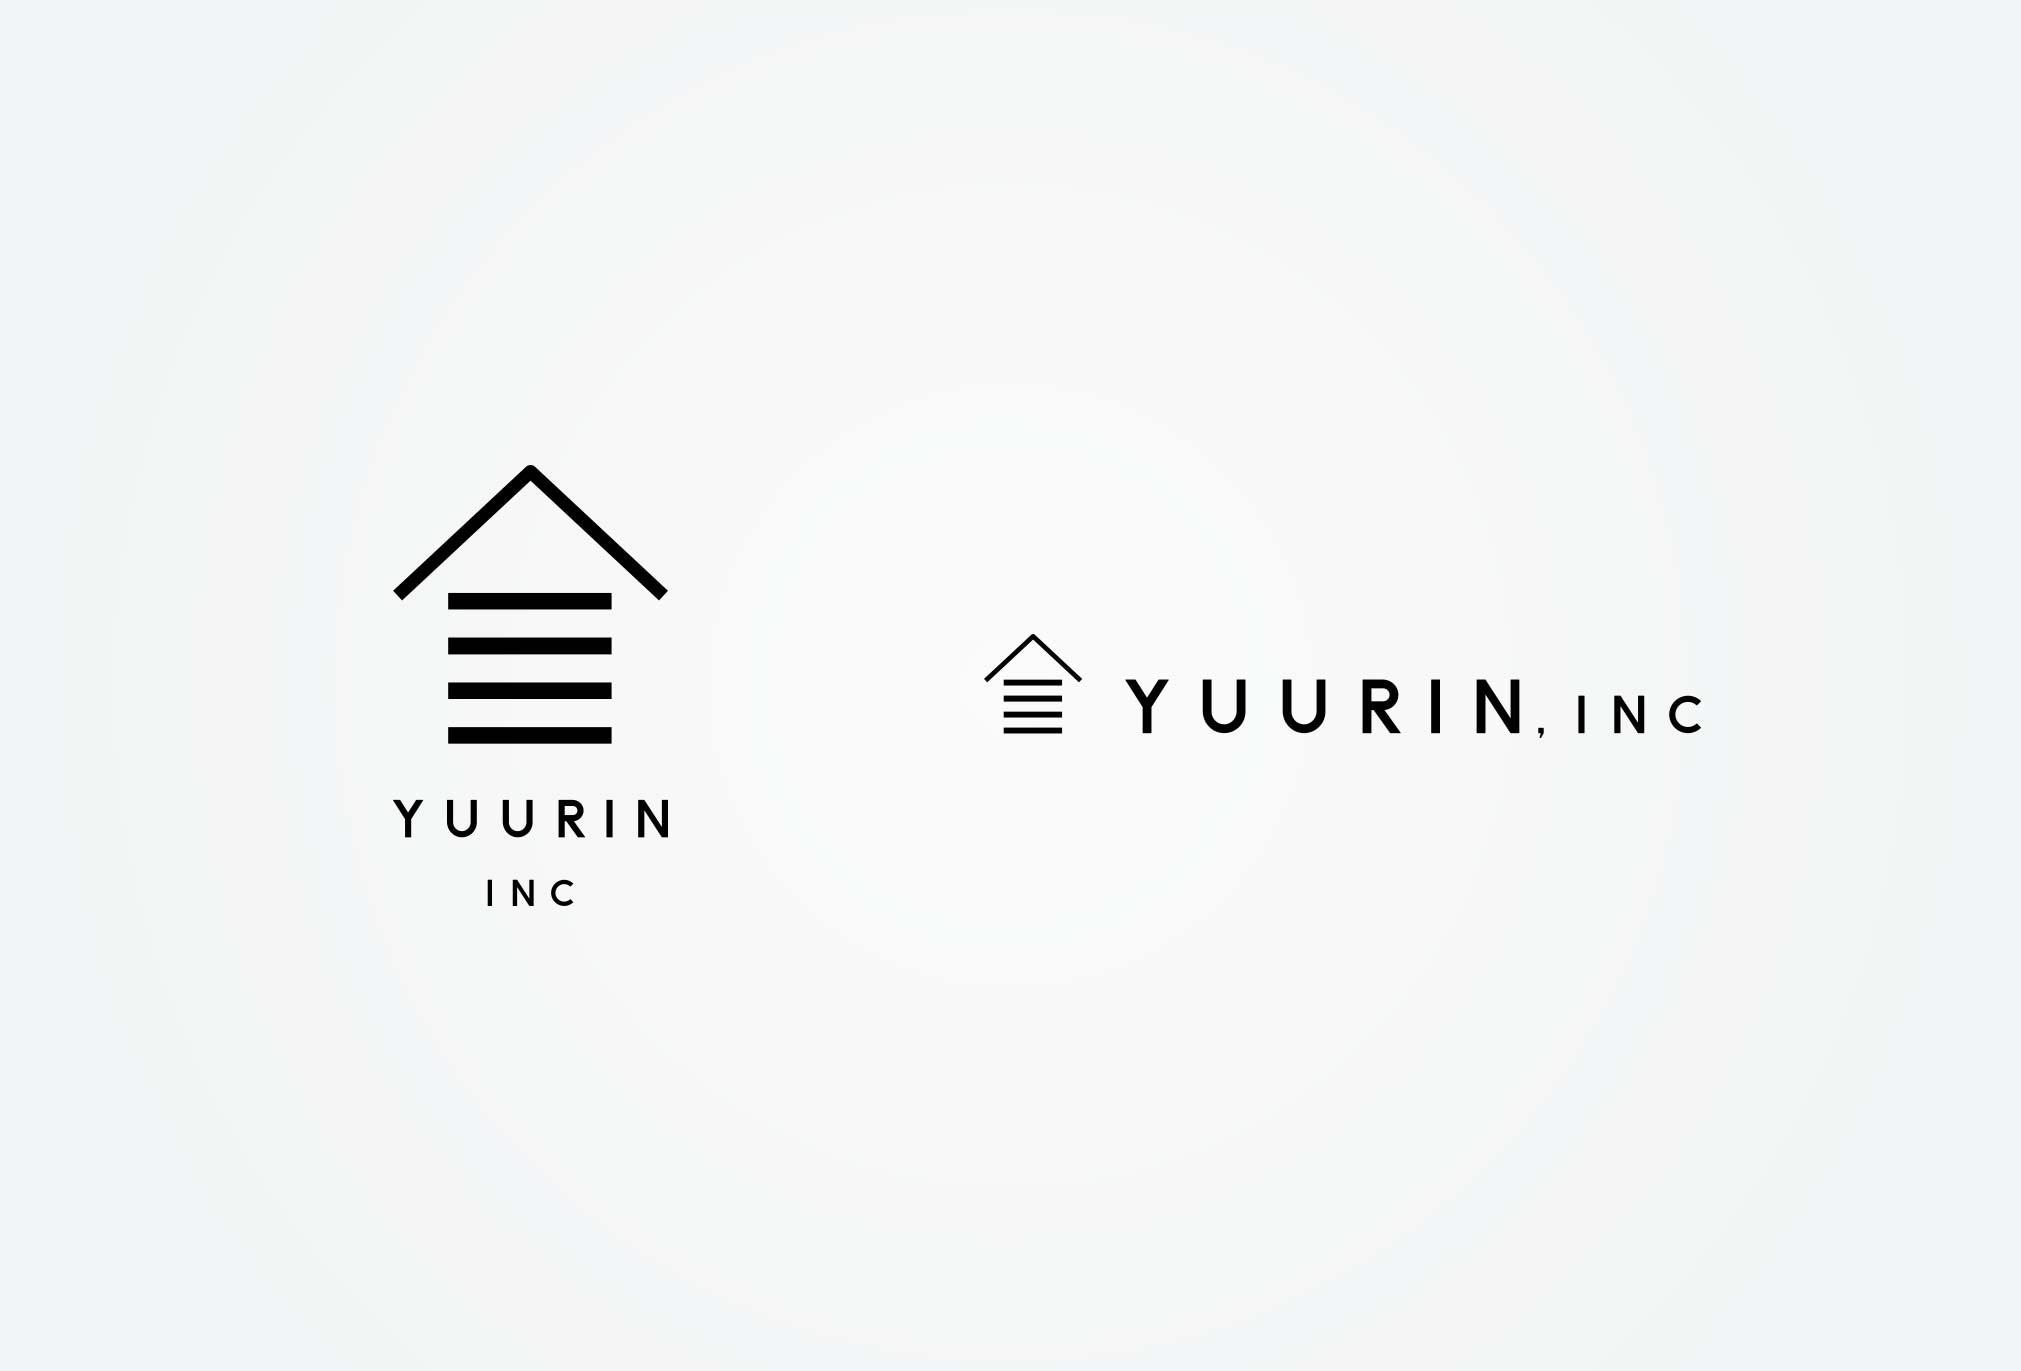 yuurin_logo3